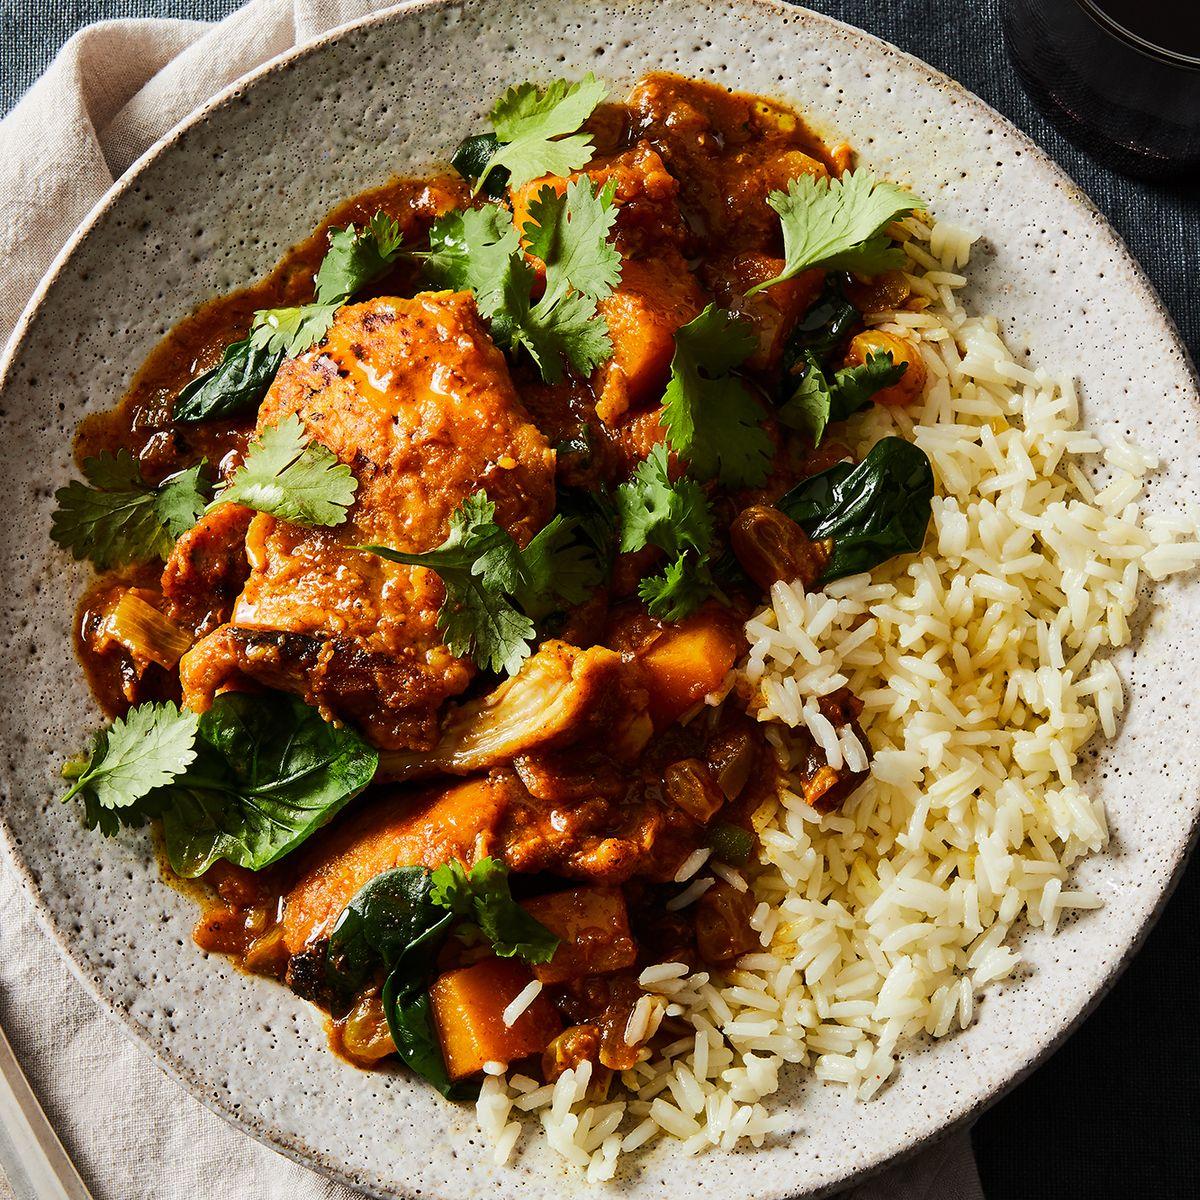 50 Best Crock Pot Recipes Easy Slow Cooker Dinner Ideas